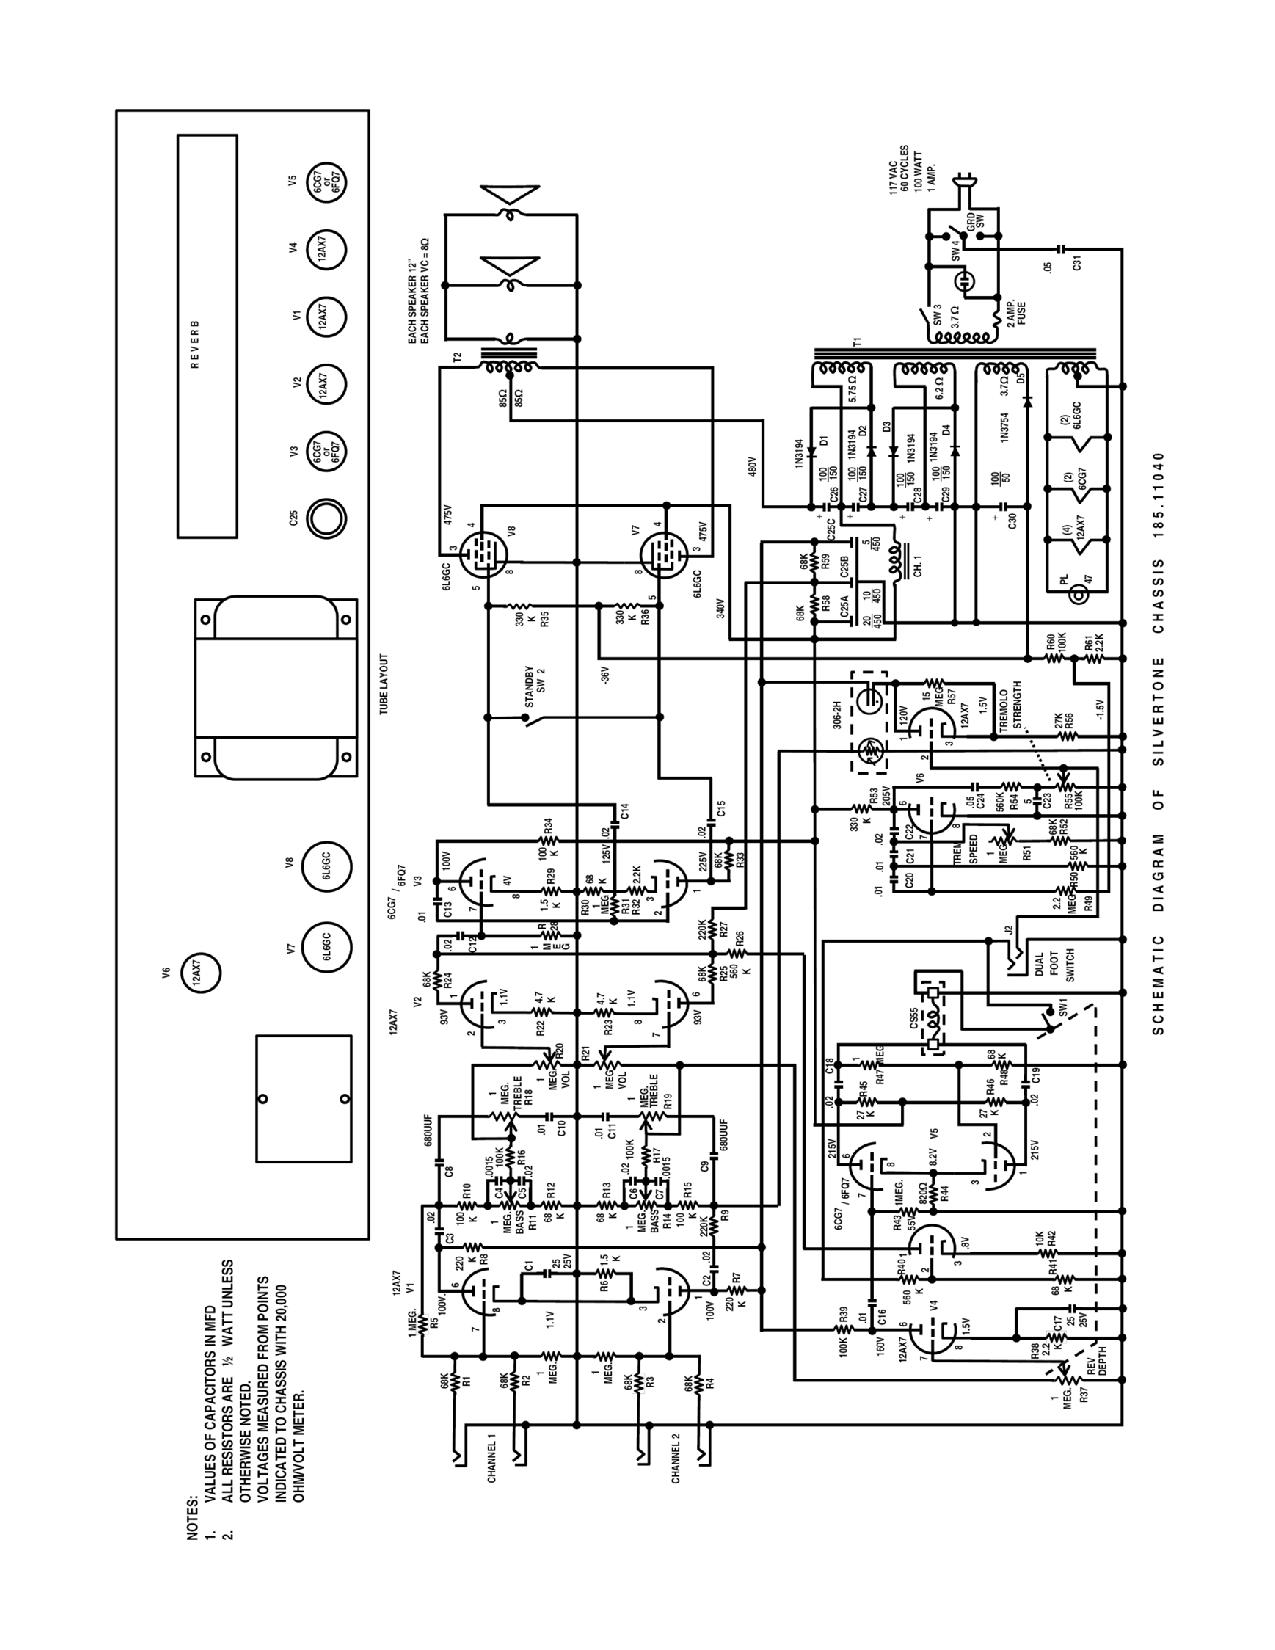 Silvertone Wiring Diagram : 25 Wiring Diagram Images